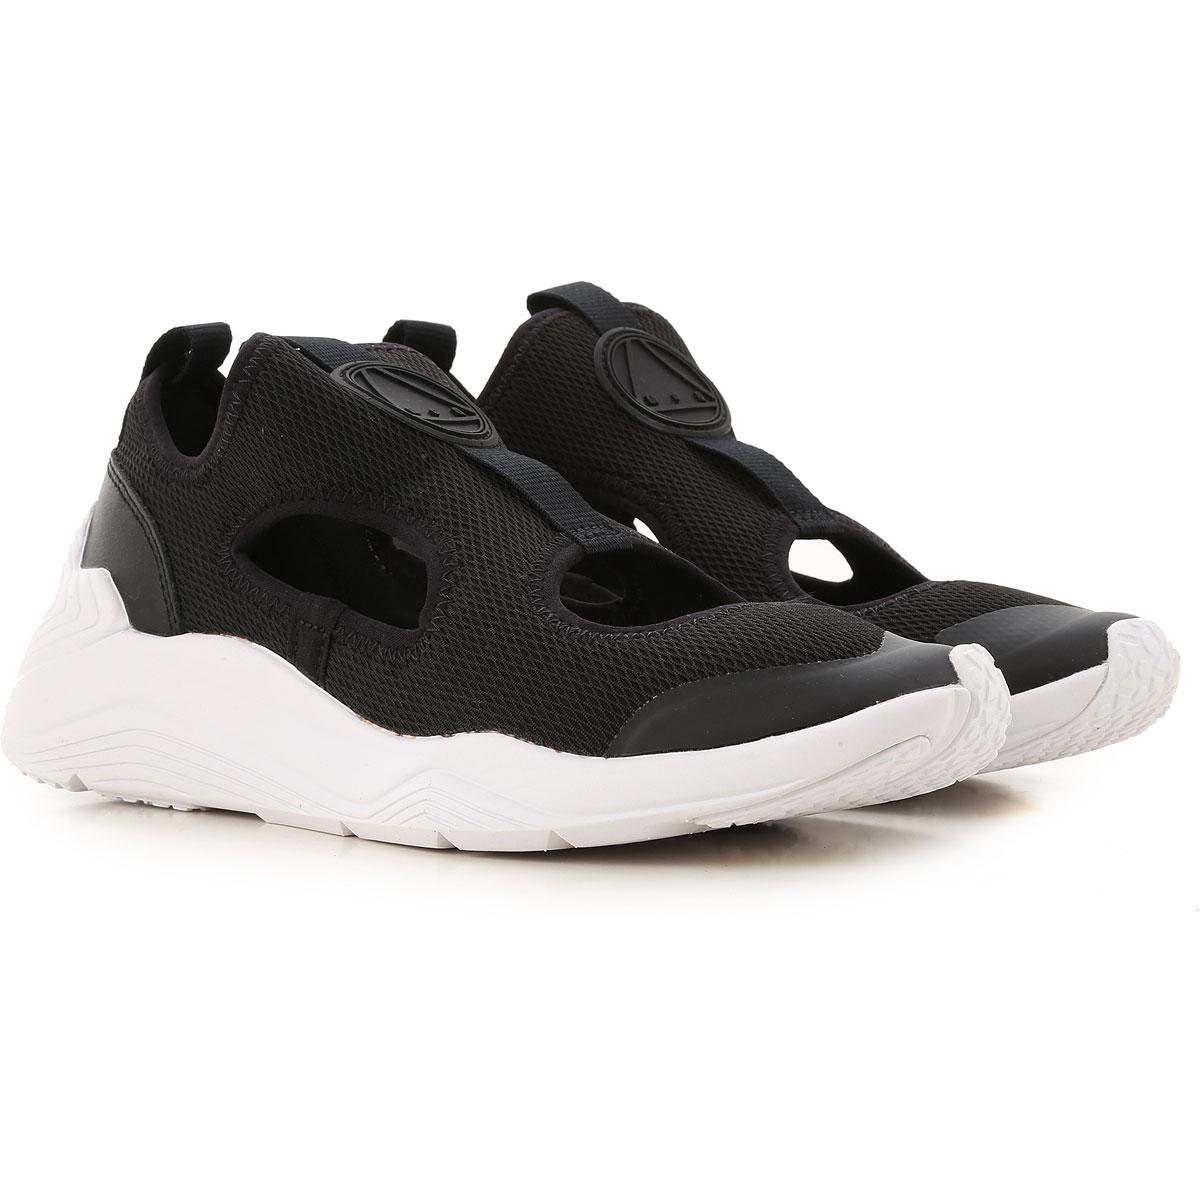 Alexander McQueen Sneakers for Women On Sale, Black, Textile, 2017, 2.5 3.5 4.5 7.5